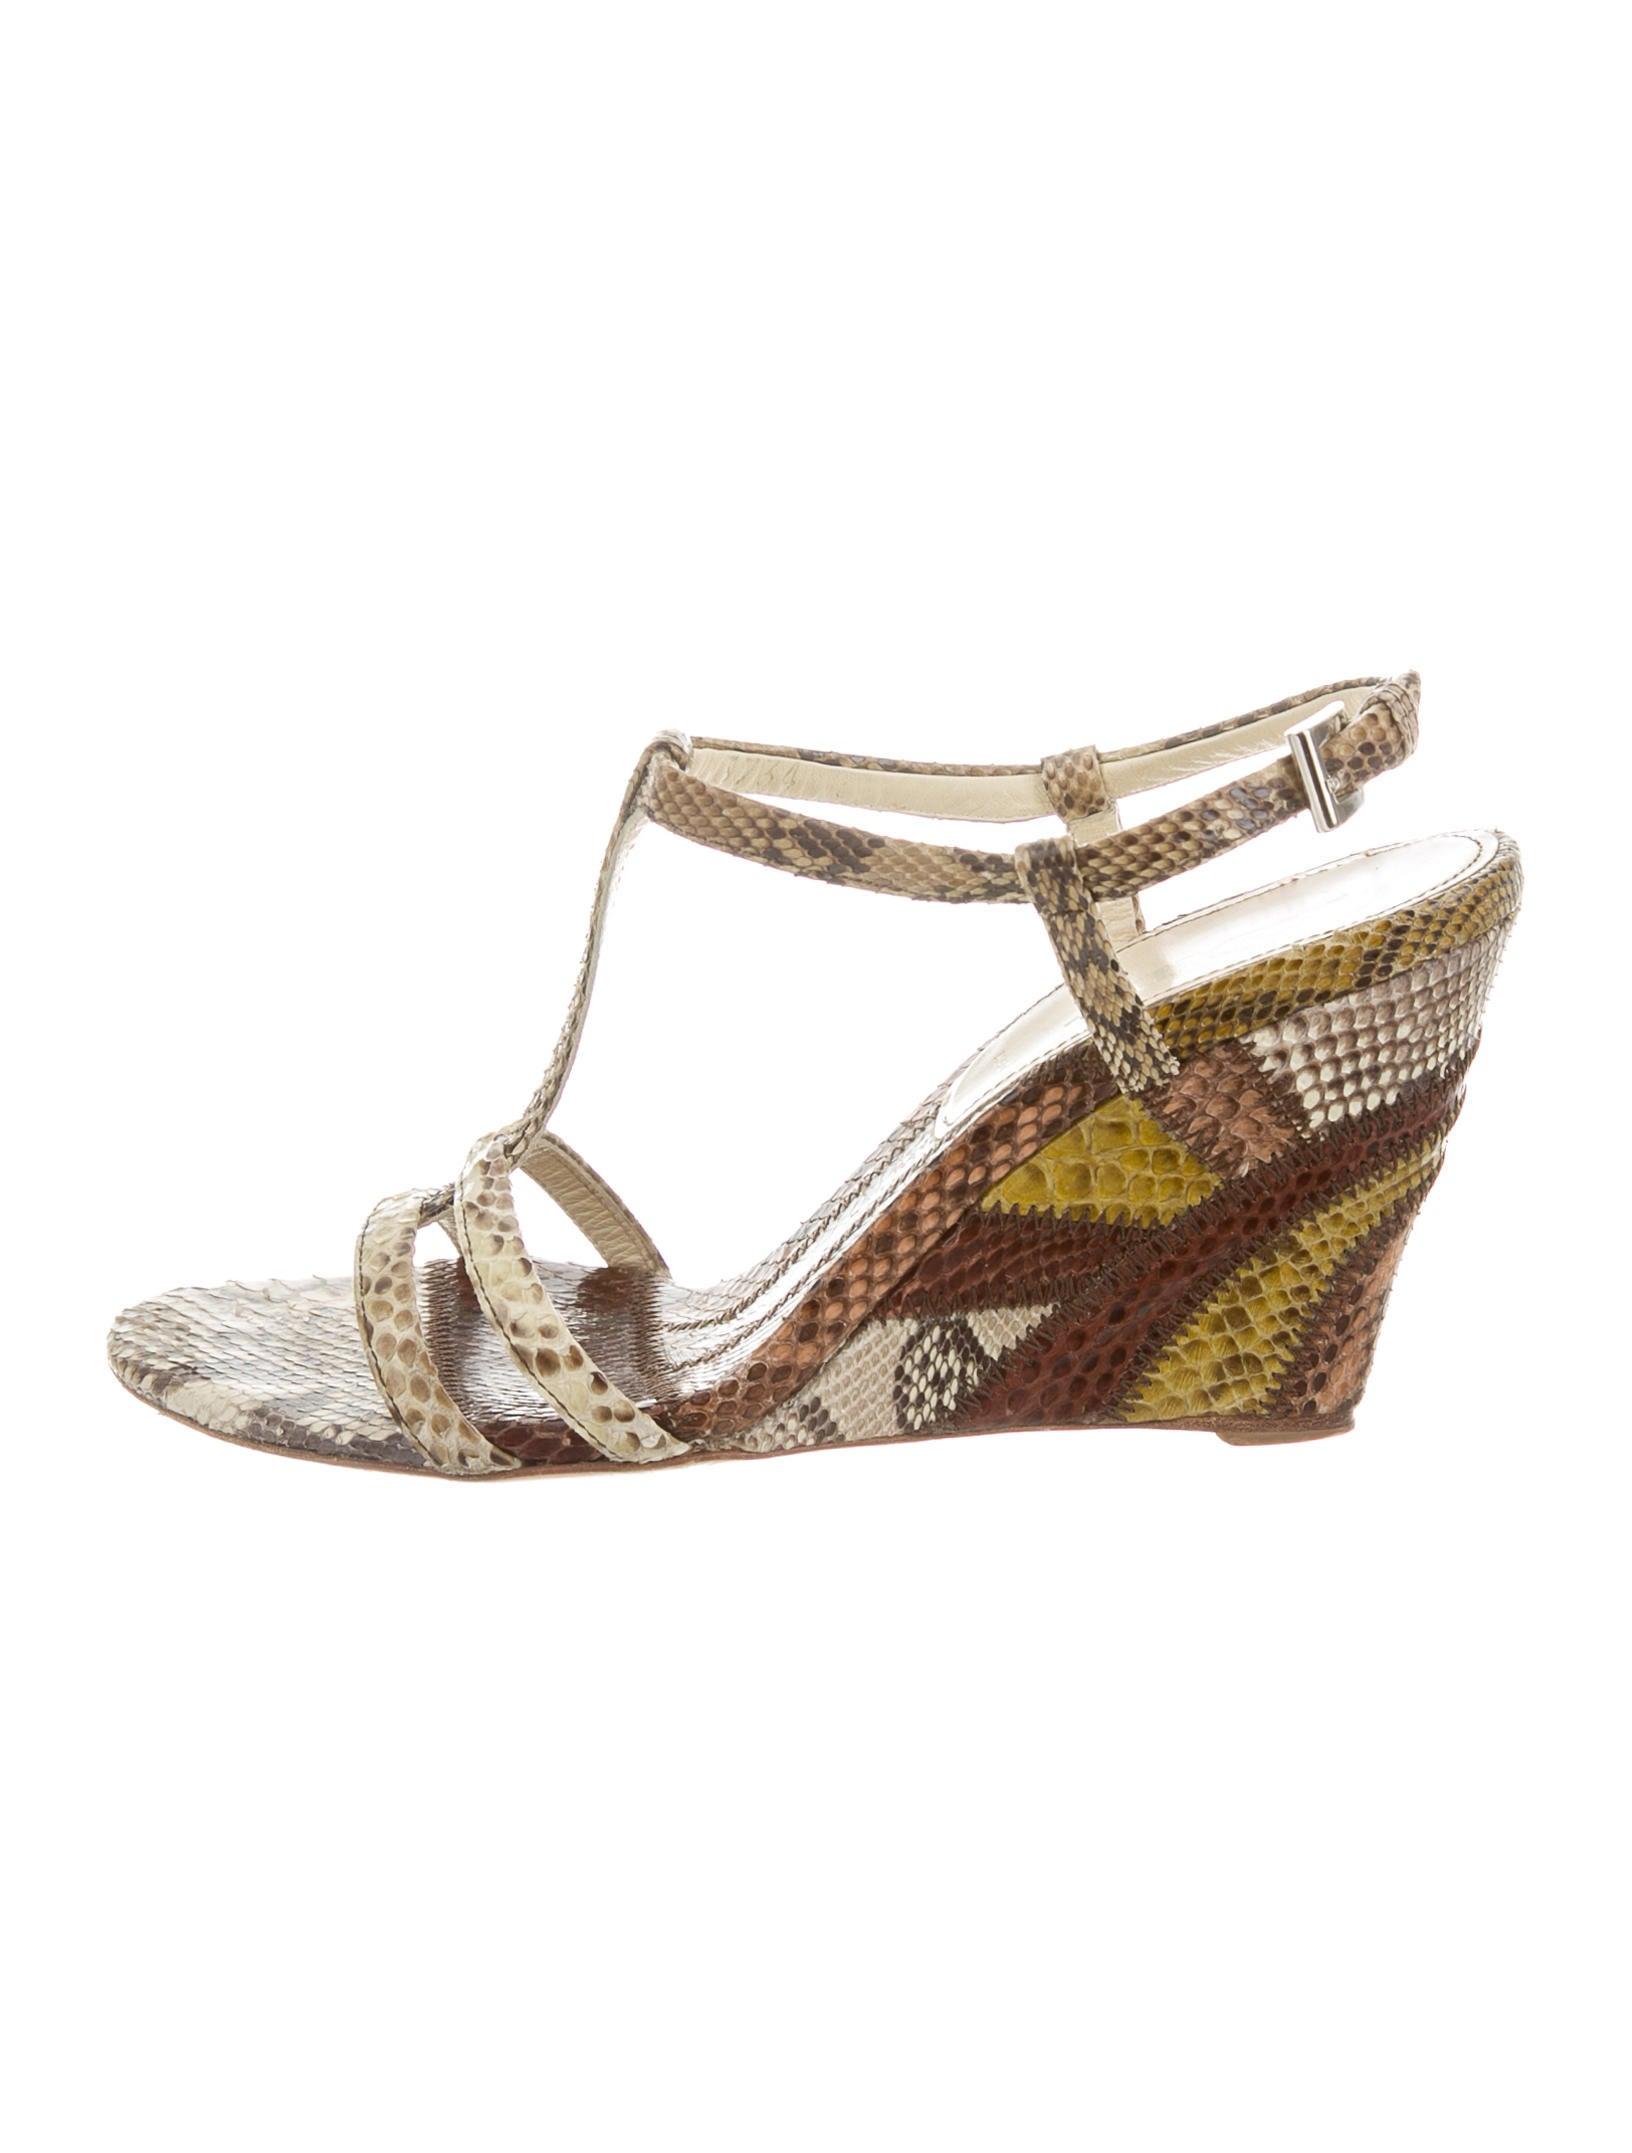 prada snakeskin wedge sandals shoes pra132630 the